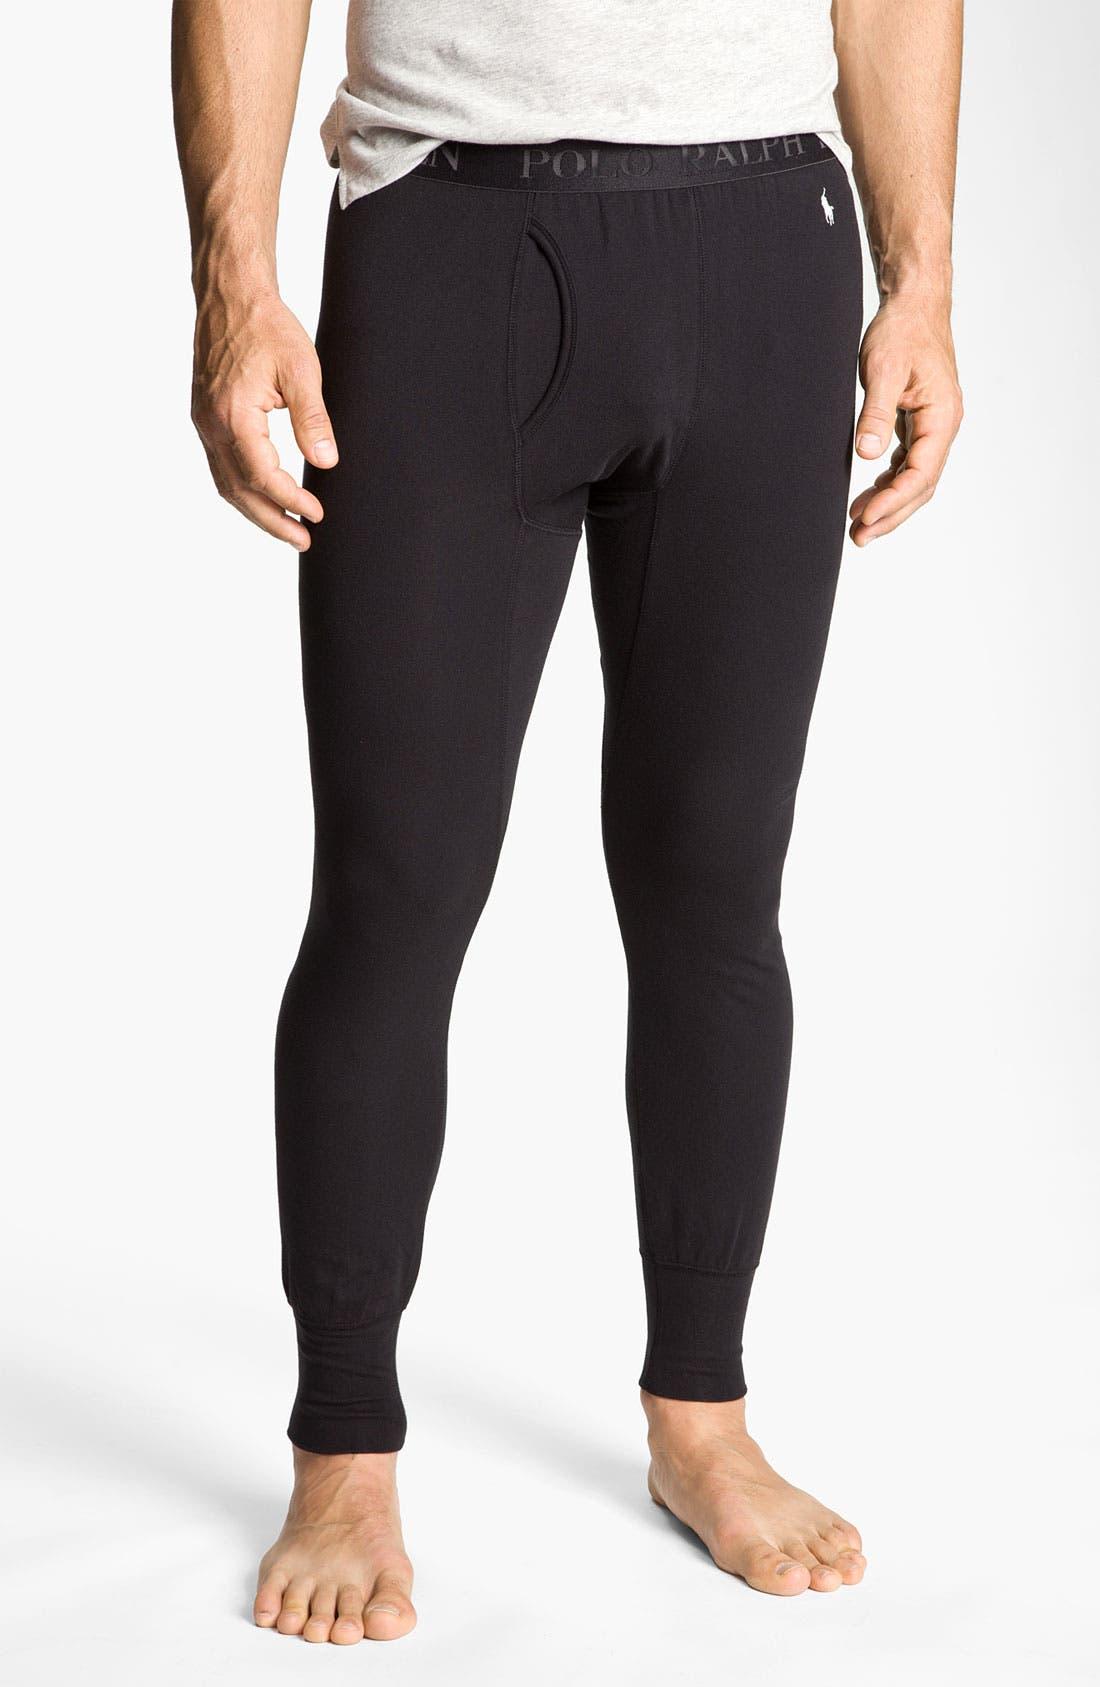 Alternate Image 1 Selected - Polo Ralph Lauren Stretch Cotton Long Underwear